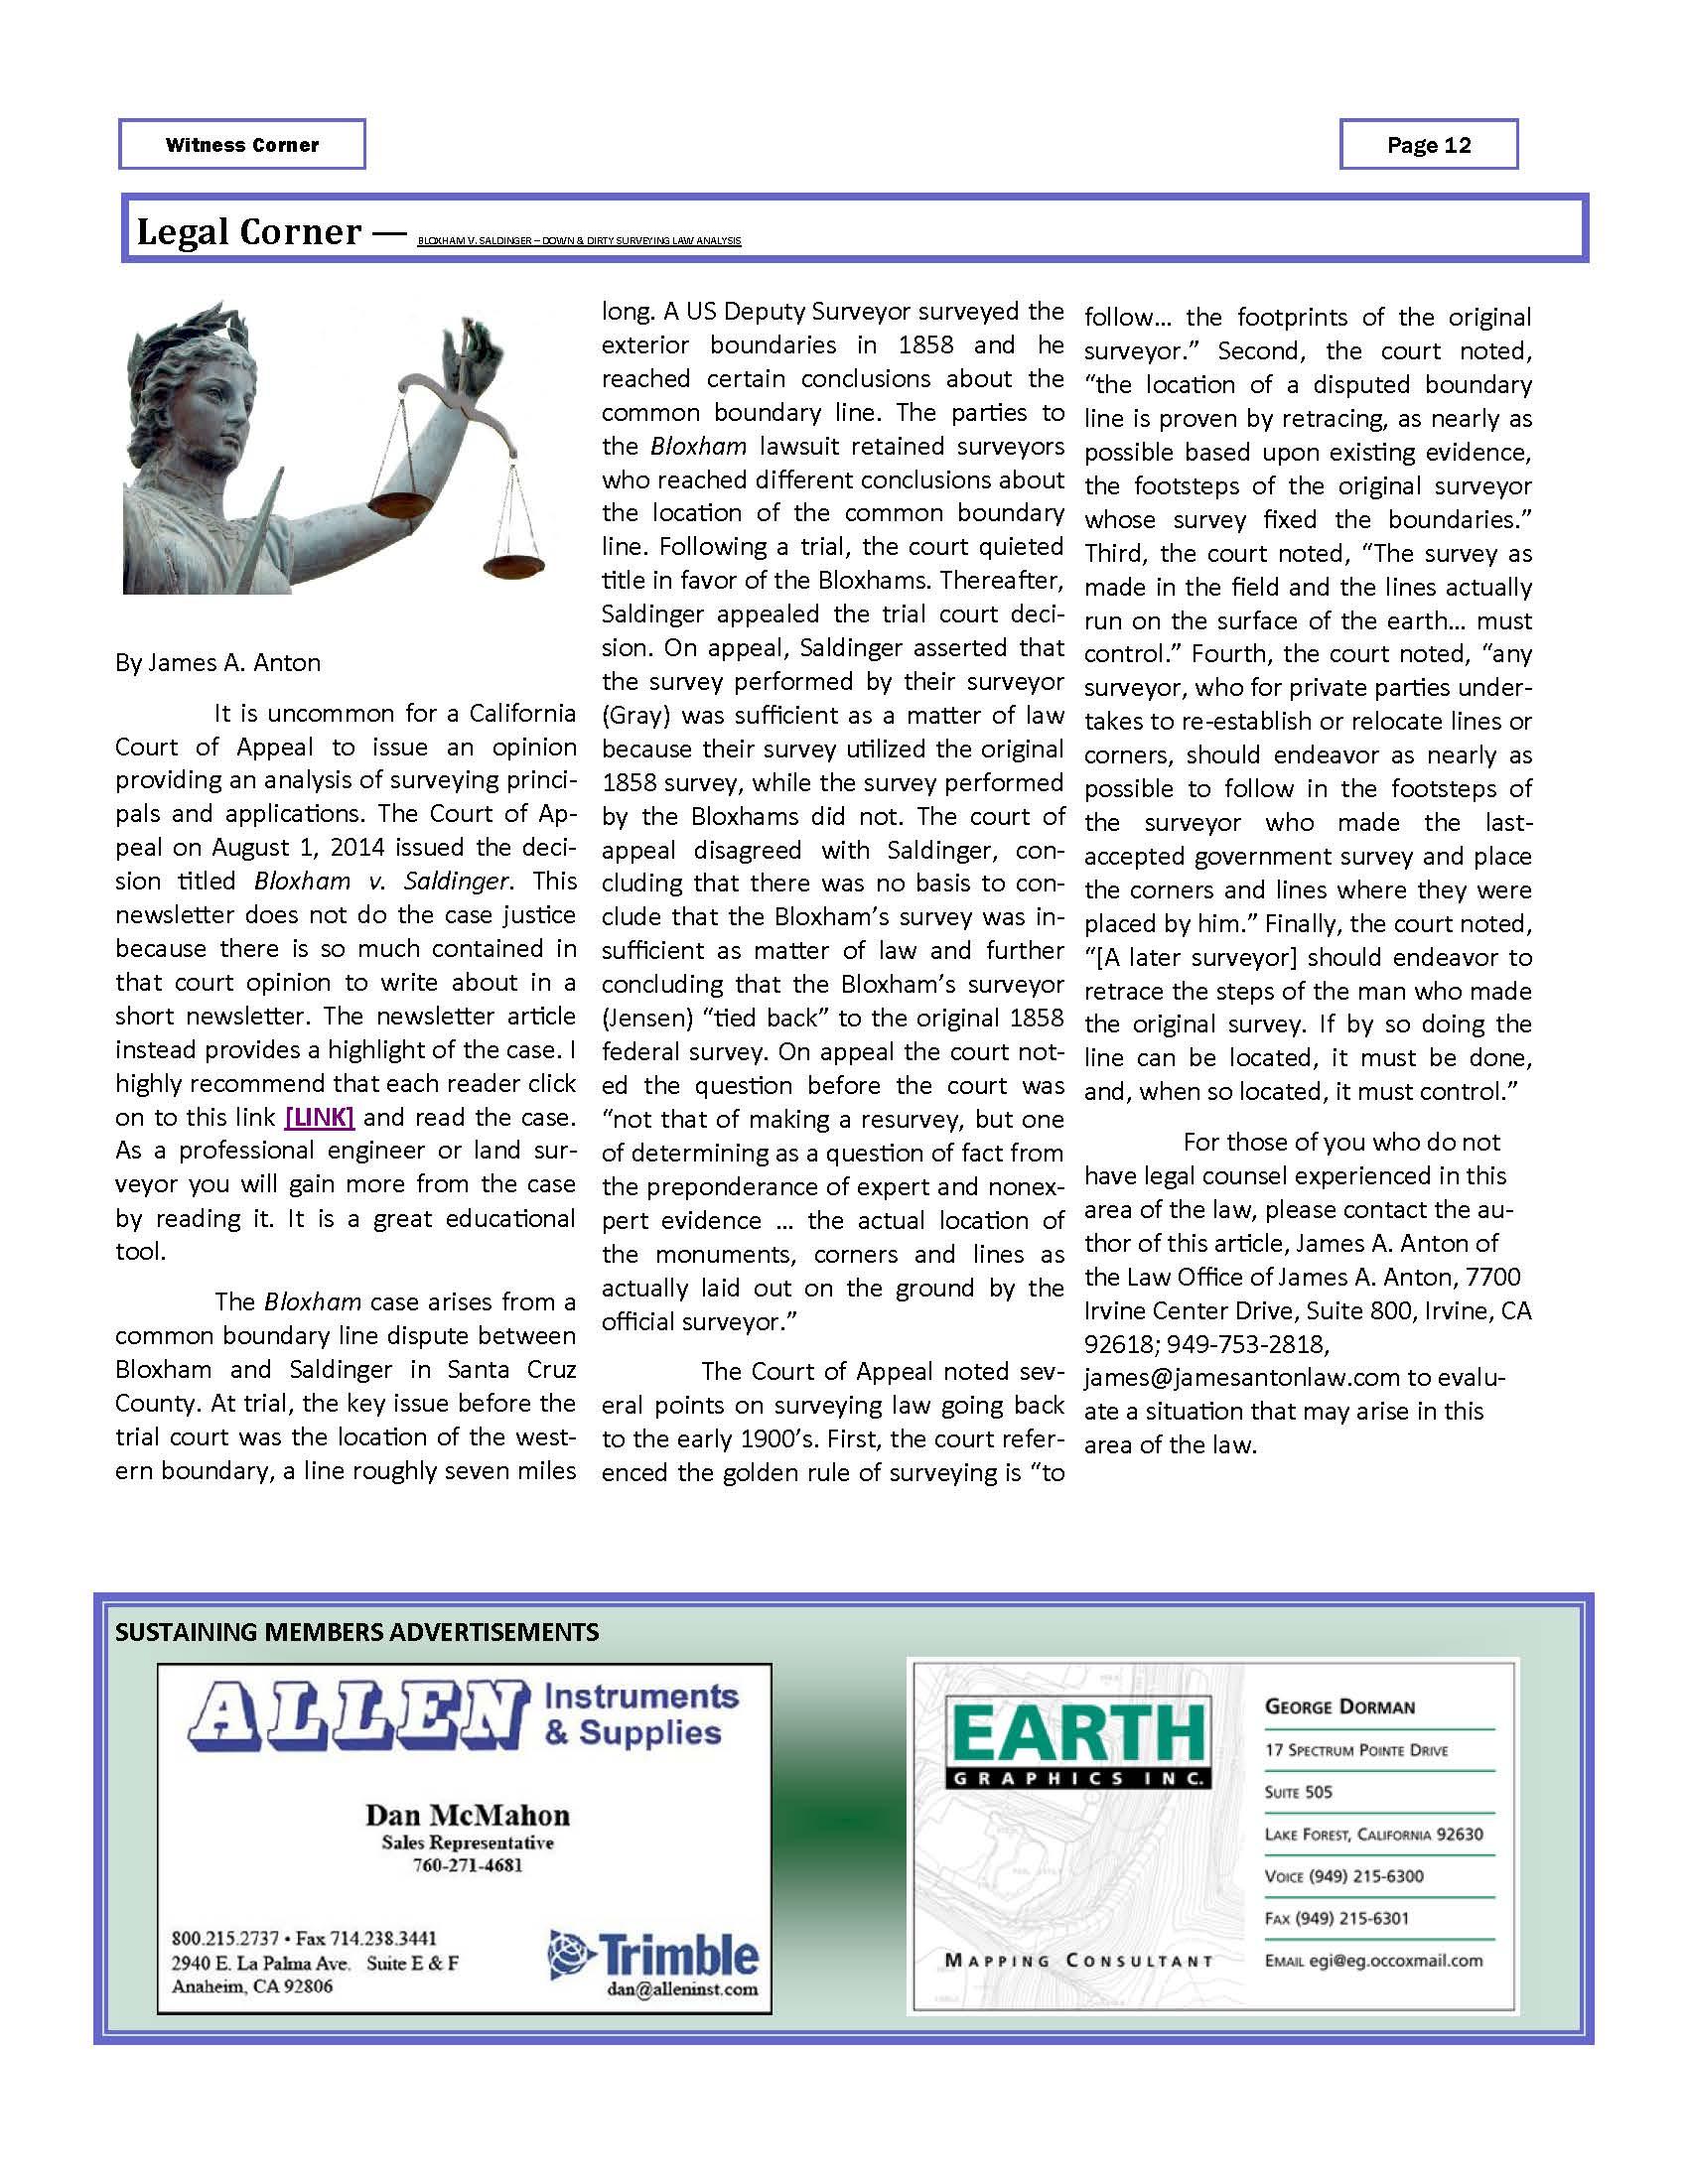 OC-CLSA 082015 Newsletter_Page_14.jpg